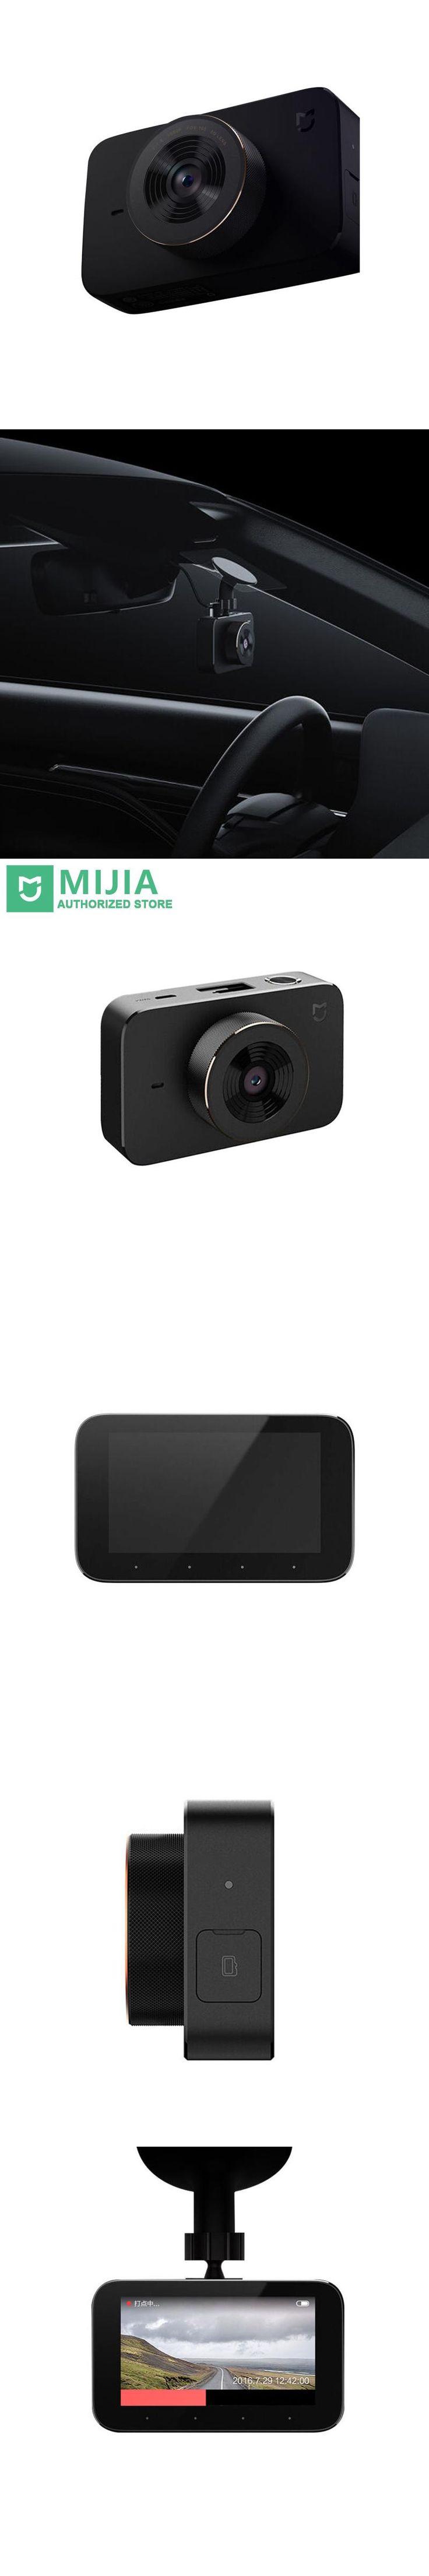 New Xiaomi Mijia Smart Car Carcorder F1.8 1080P 160 Degree Wide Angle 3 Inch HD Screen WiFi Connection Car Mi DVR